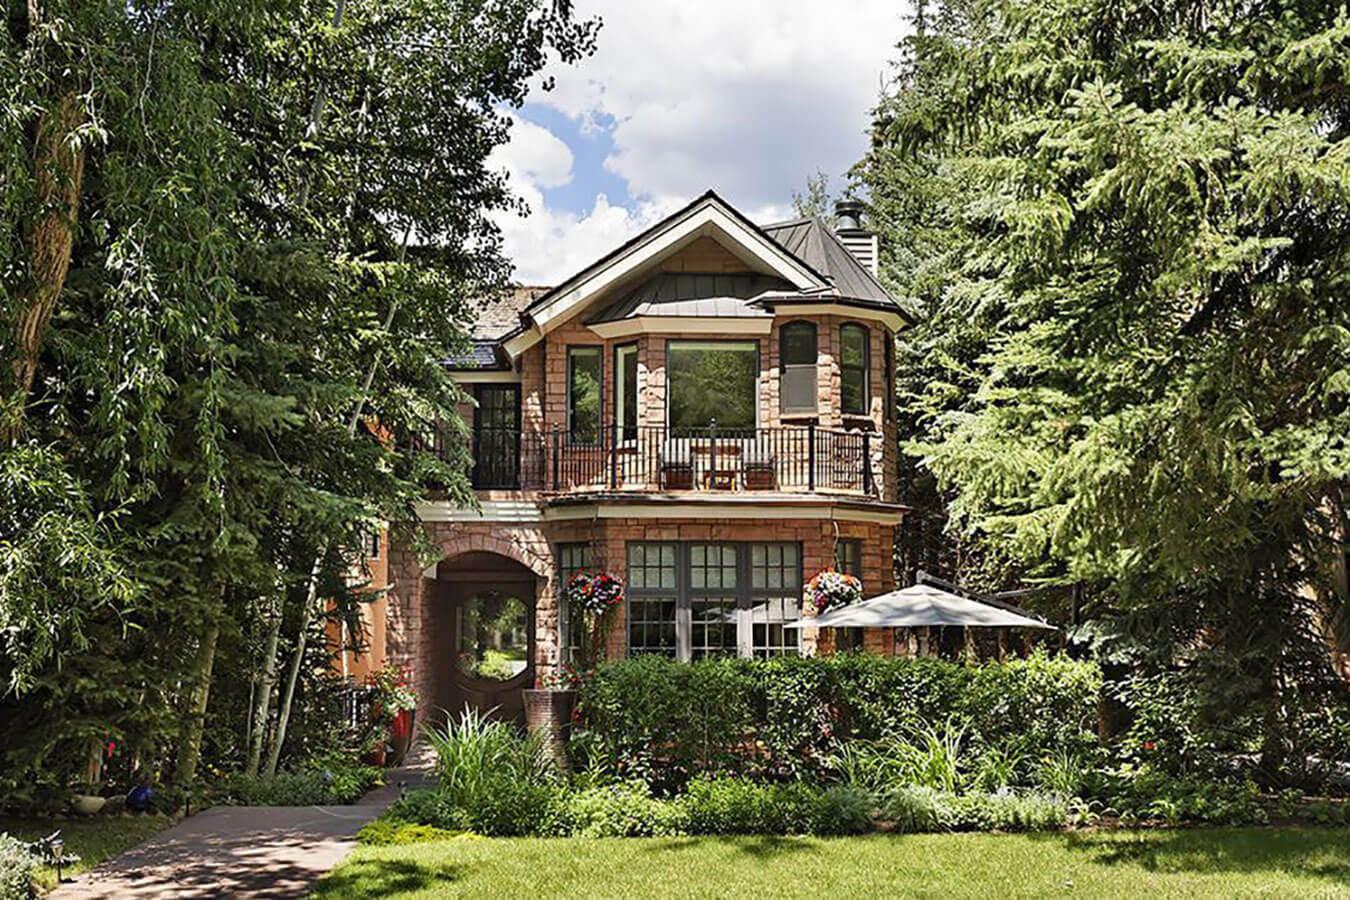 Hallam Residence - Aspen Architect Brewster McLeod